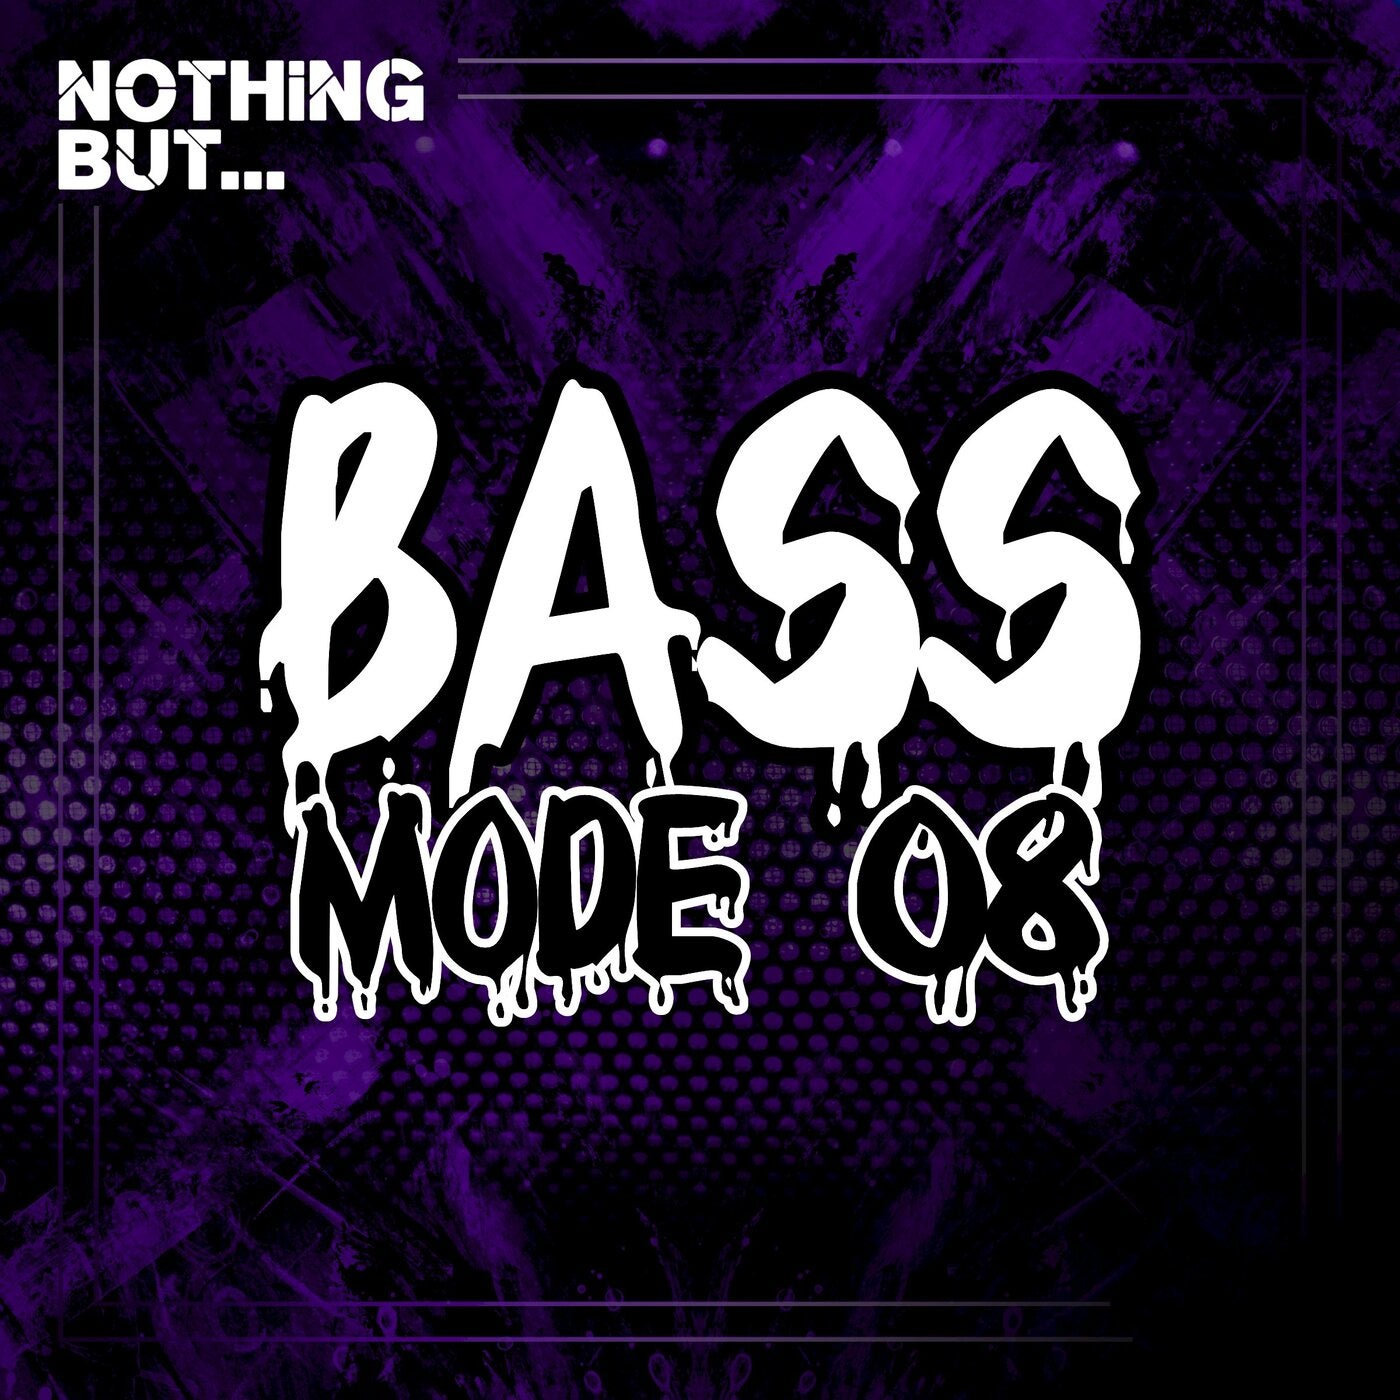 VA- Nothing But... Bass Mode, Vol. 08 [NBBM08]